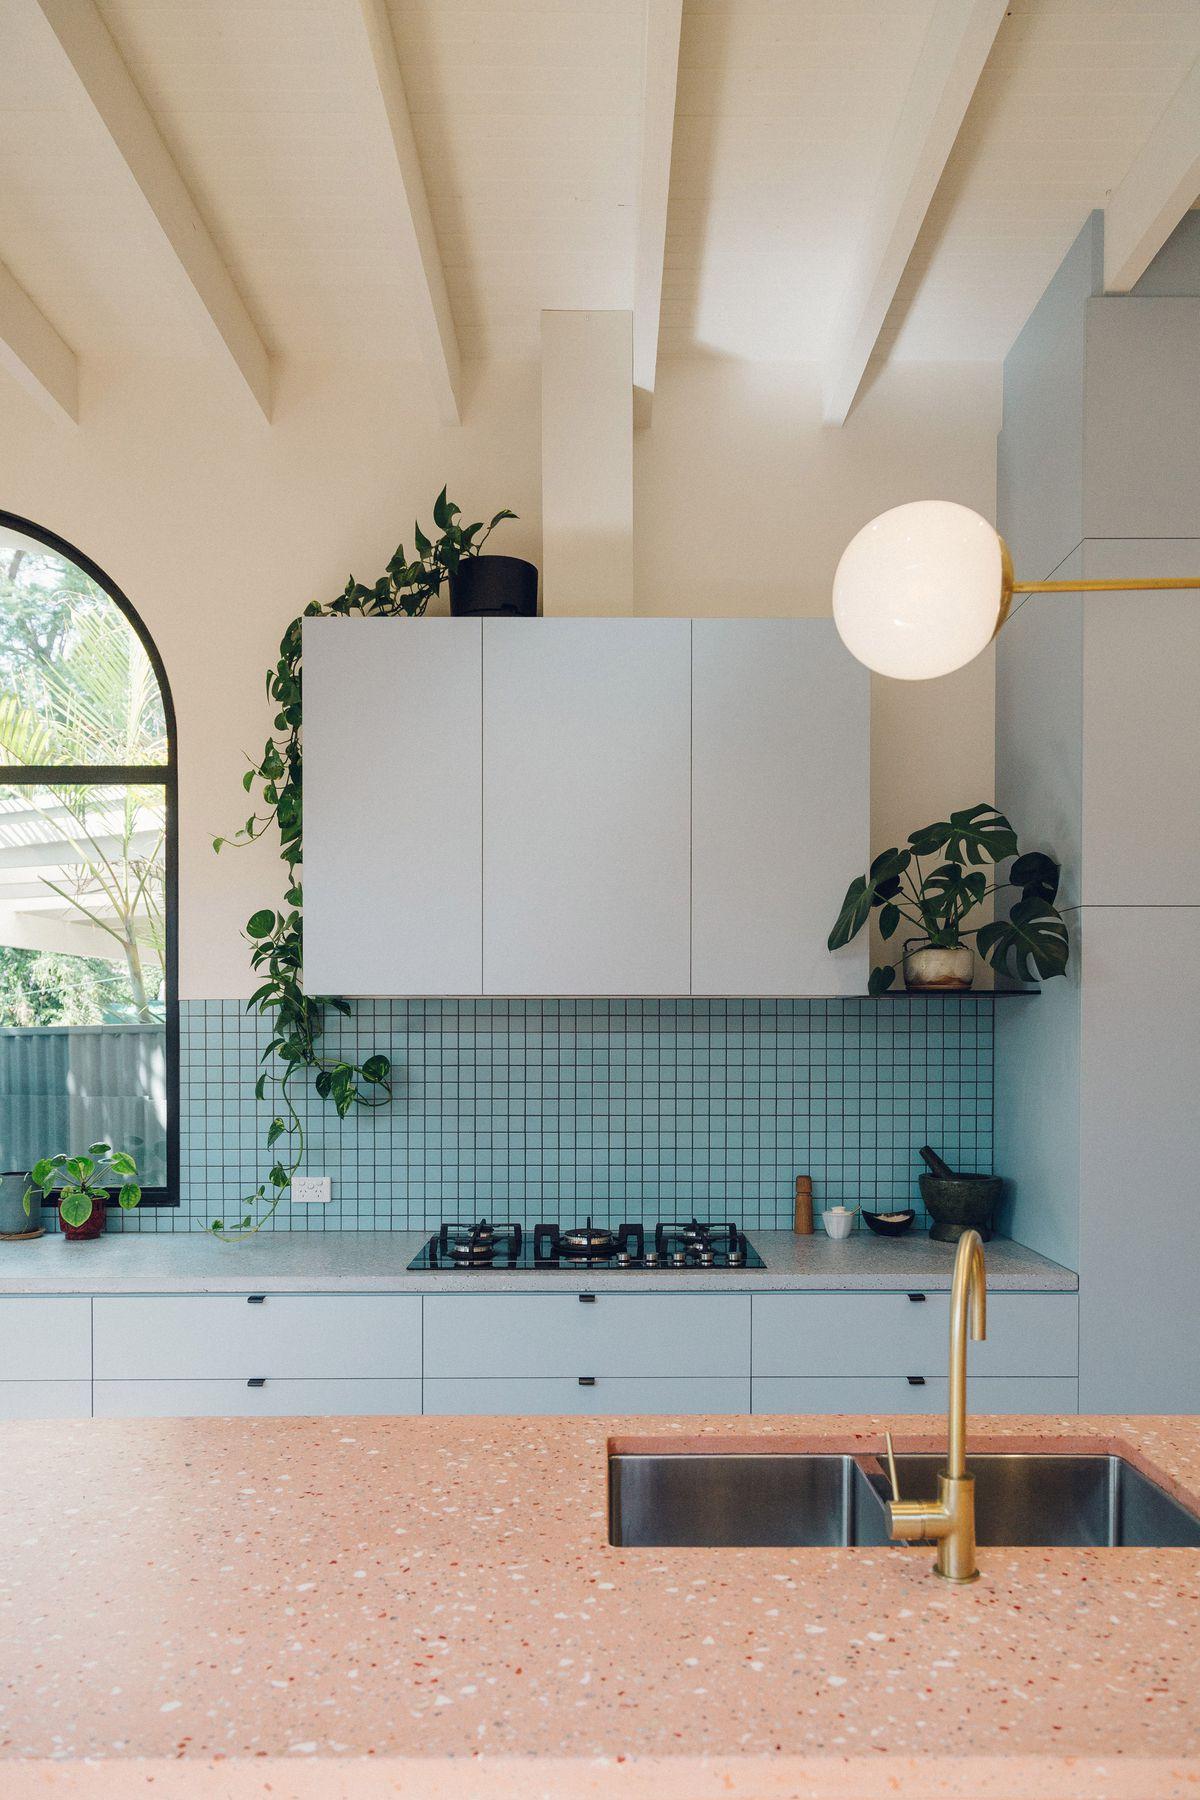 Kitchen with blue backsplash